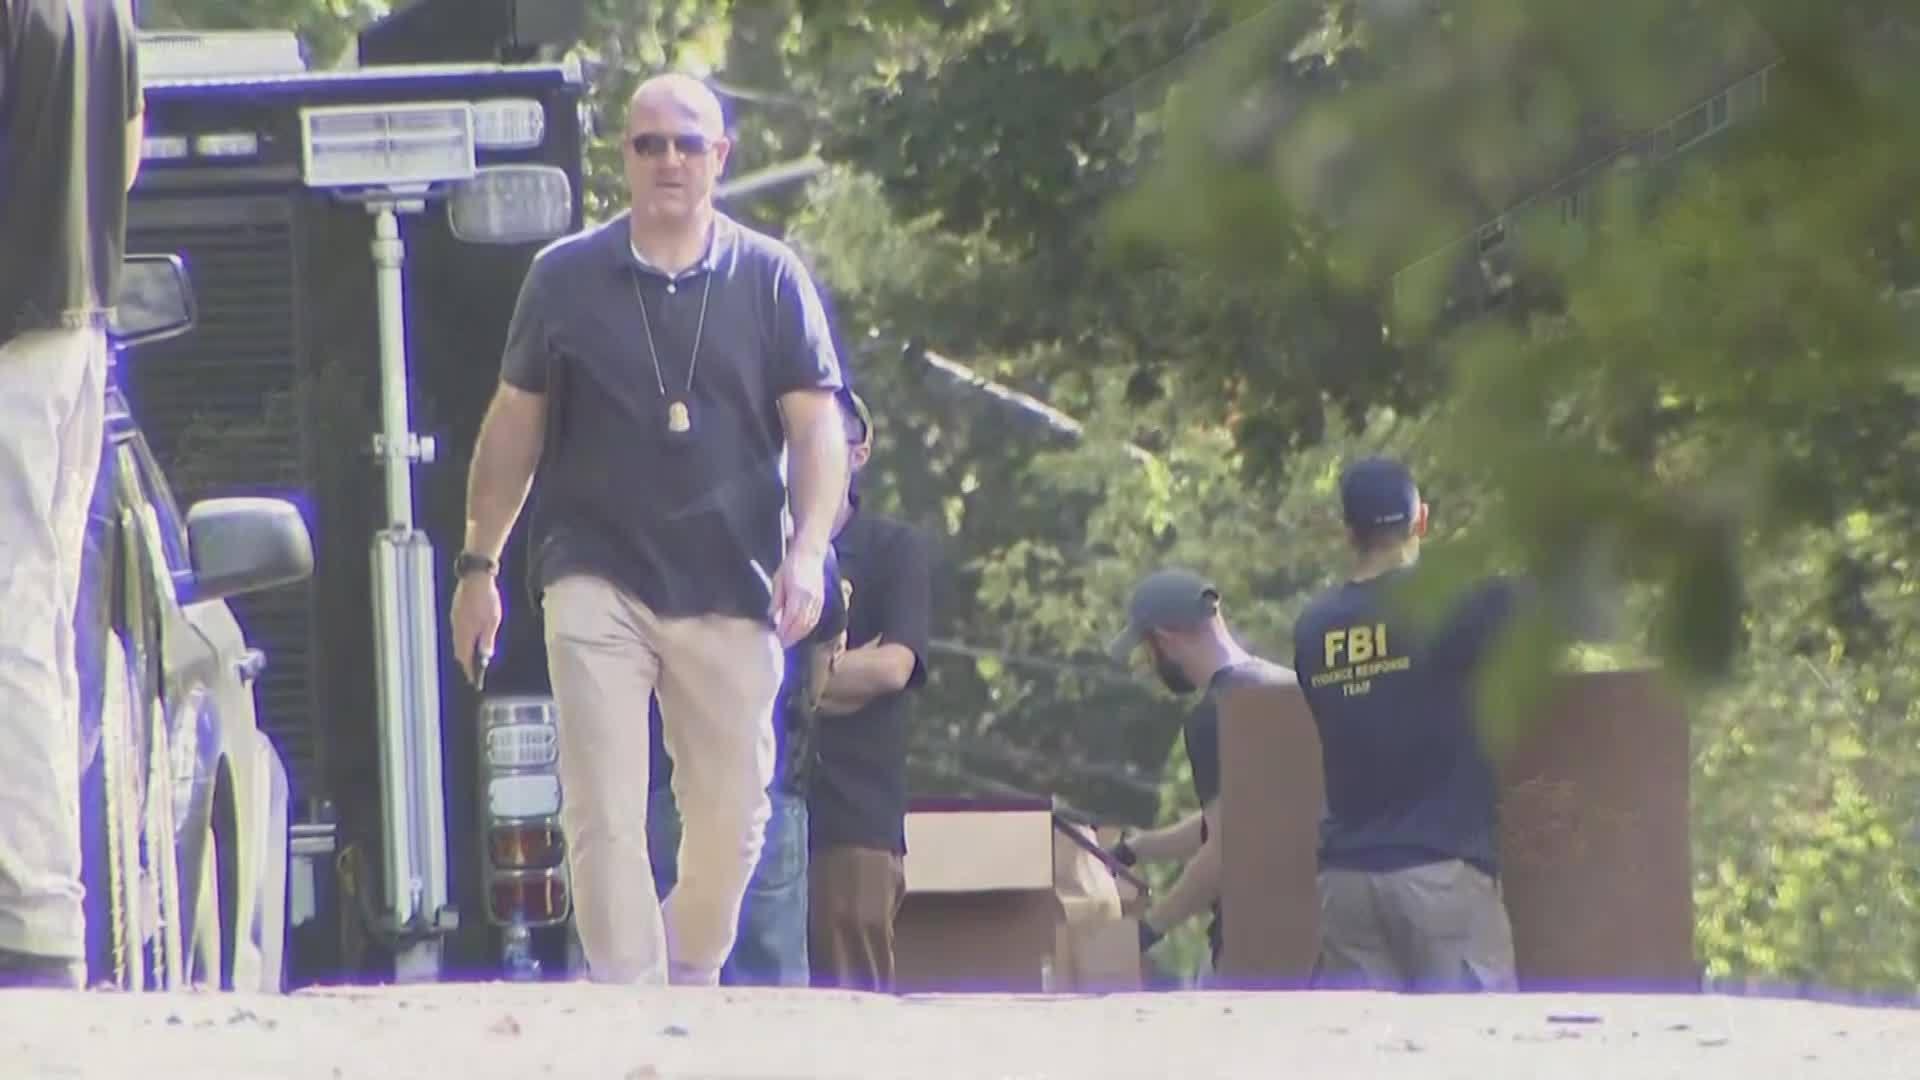 Man_arrested_in_NY_bomb_threat_0_20181011181050